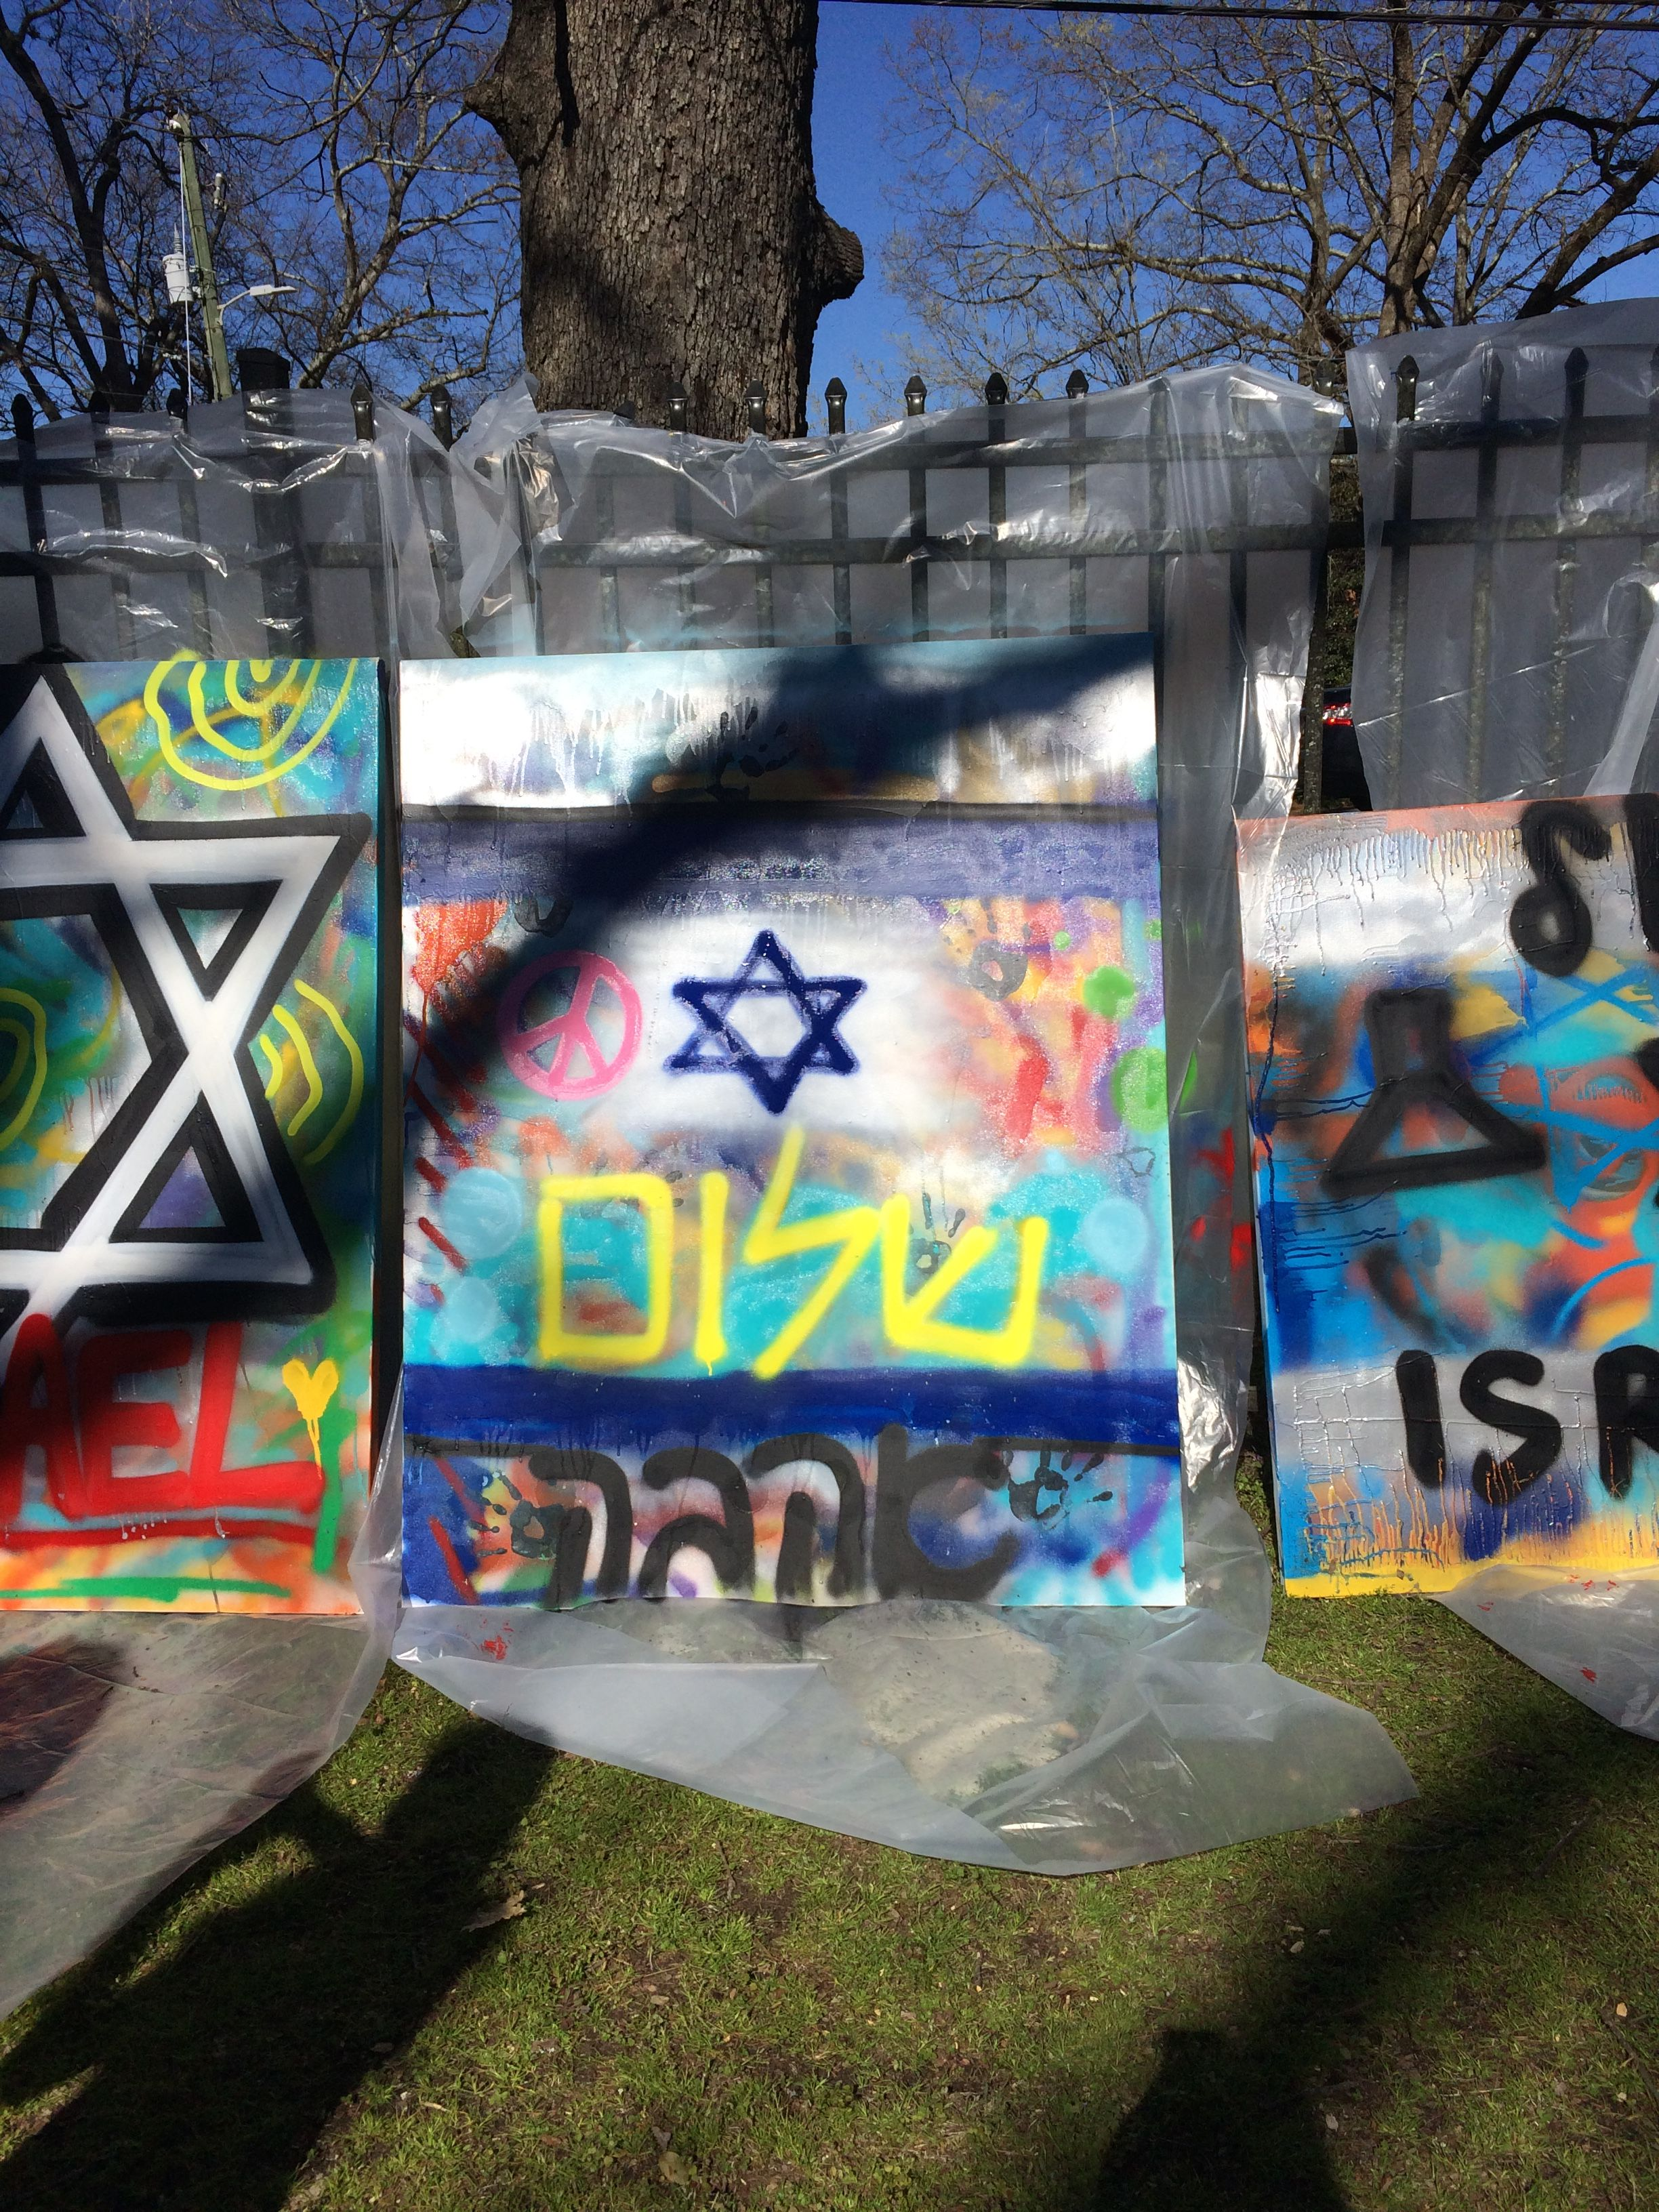 4 5 j serve israeli graffiti got to do the coolest art with professional graffiti artists